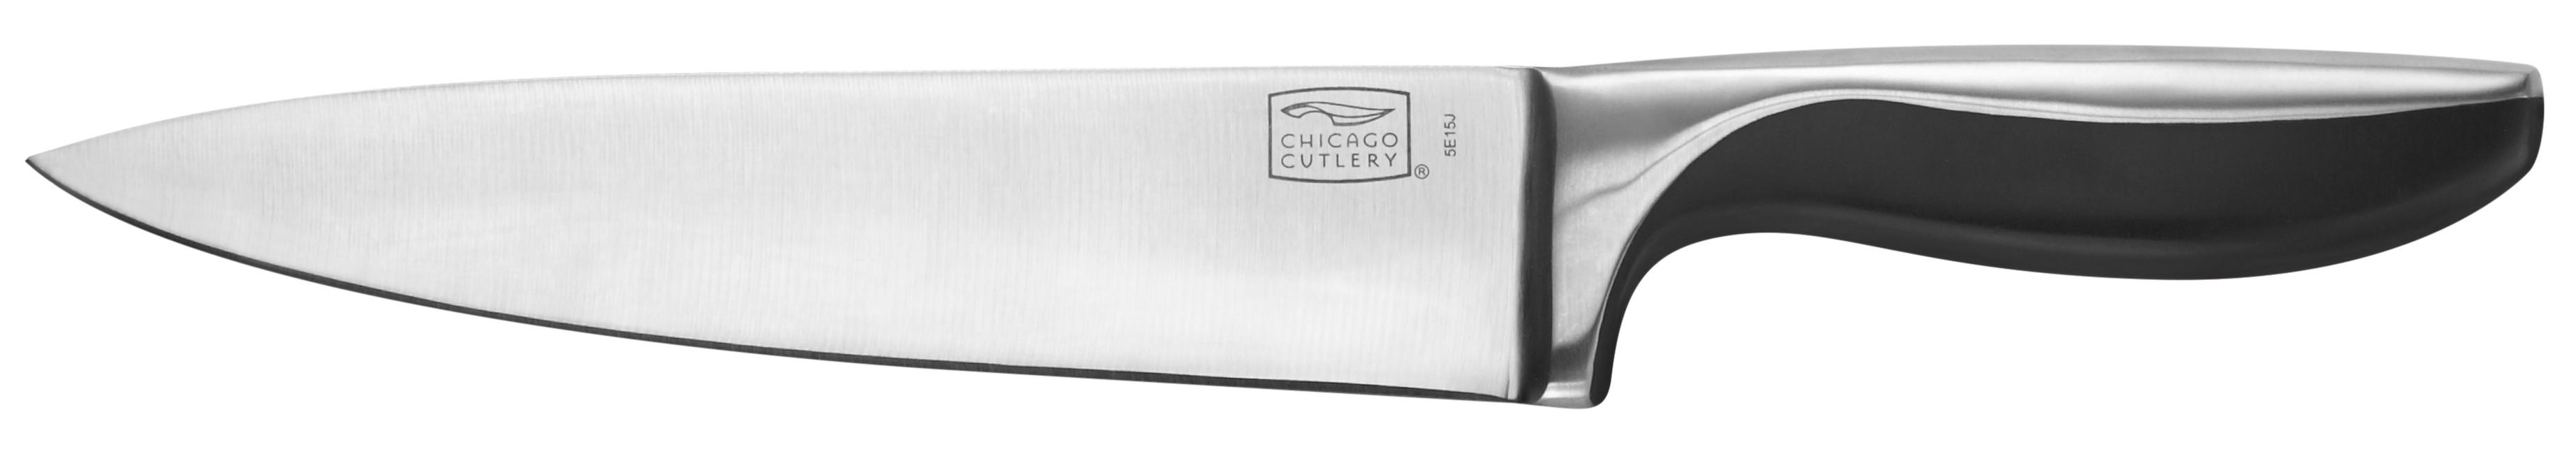 Amazon Com Chicago Cutlery 16 Piece Avondale Knife Block